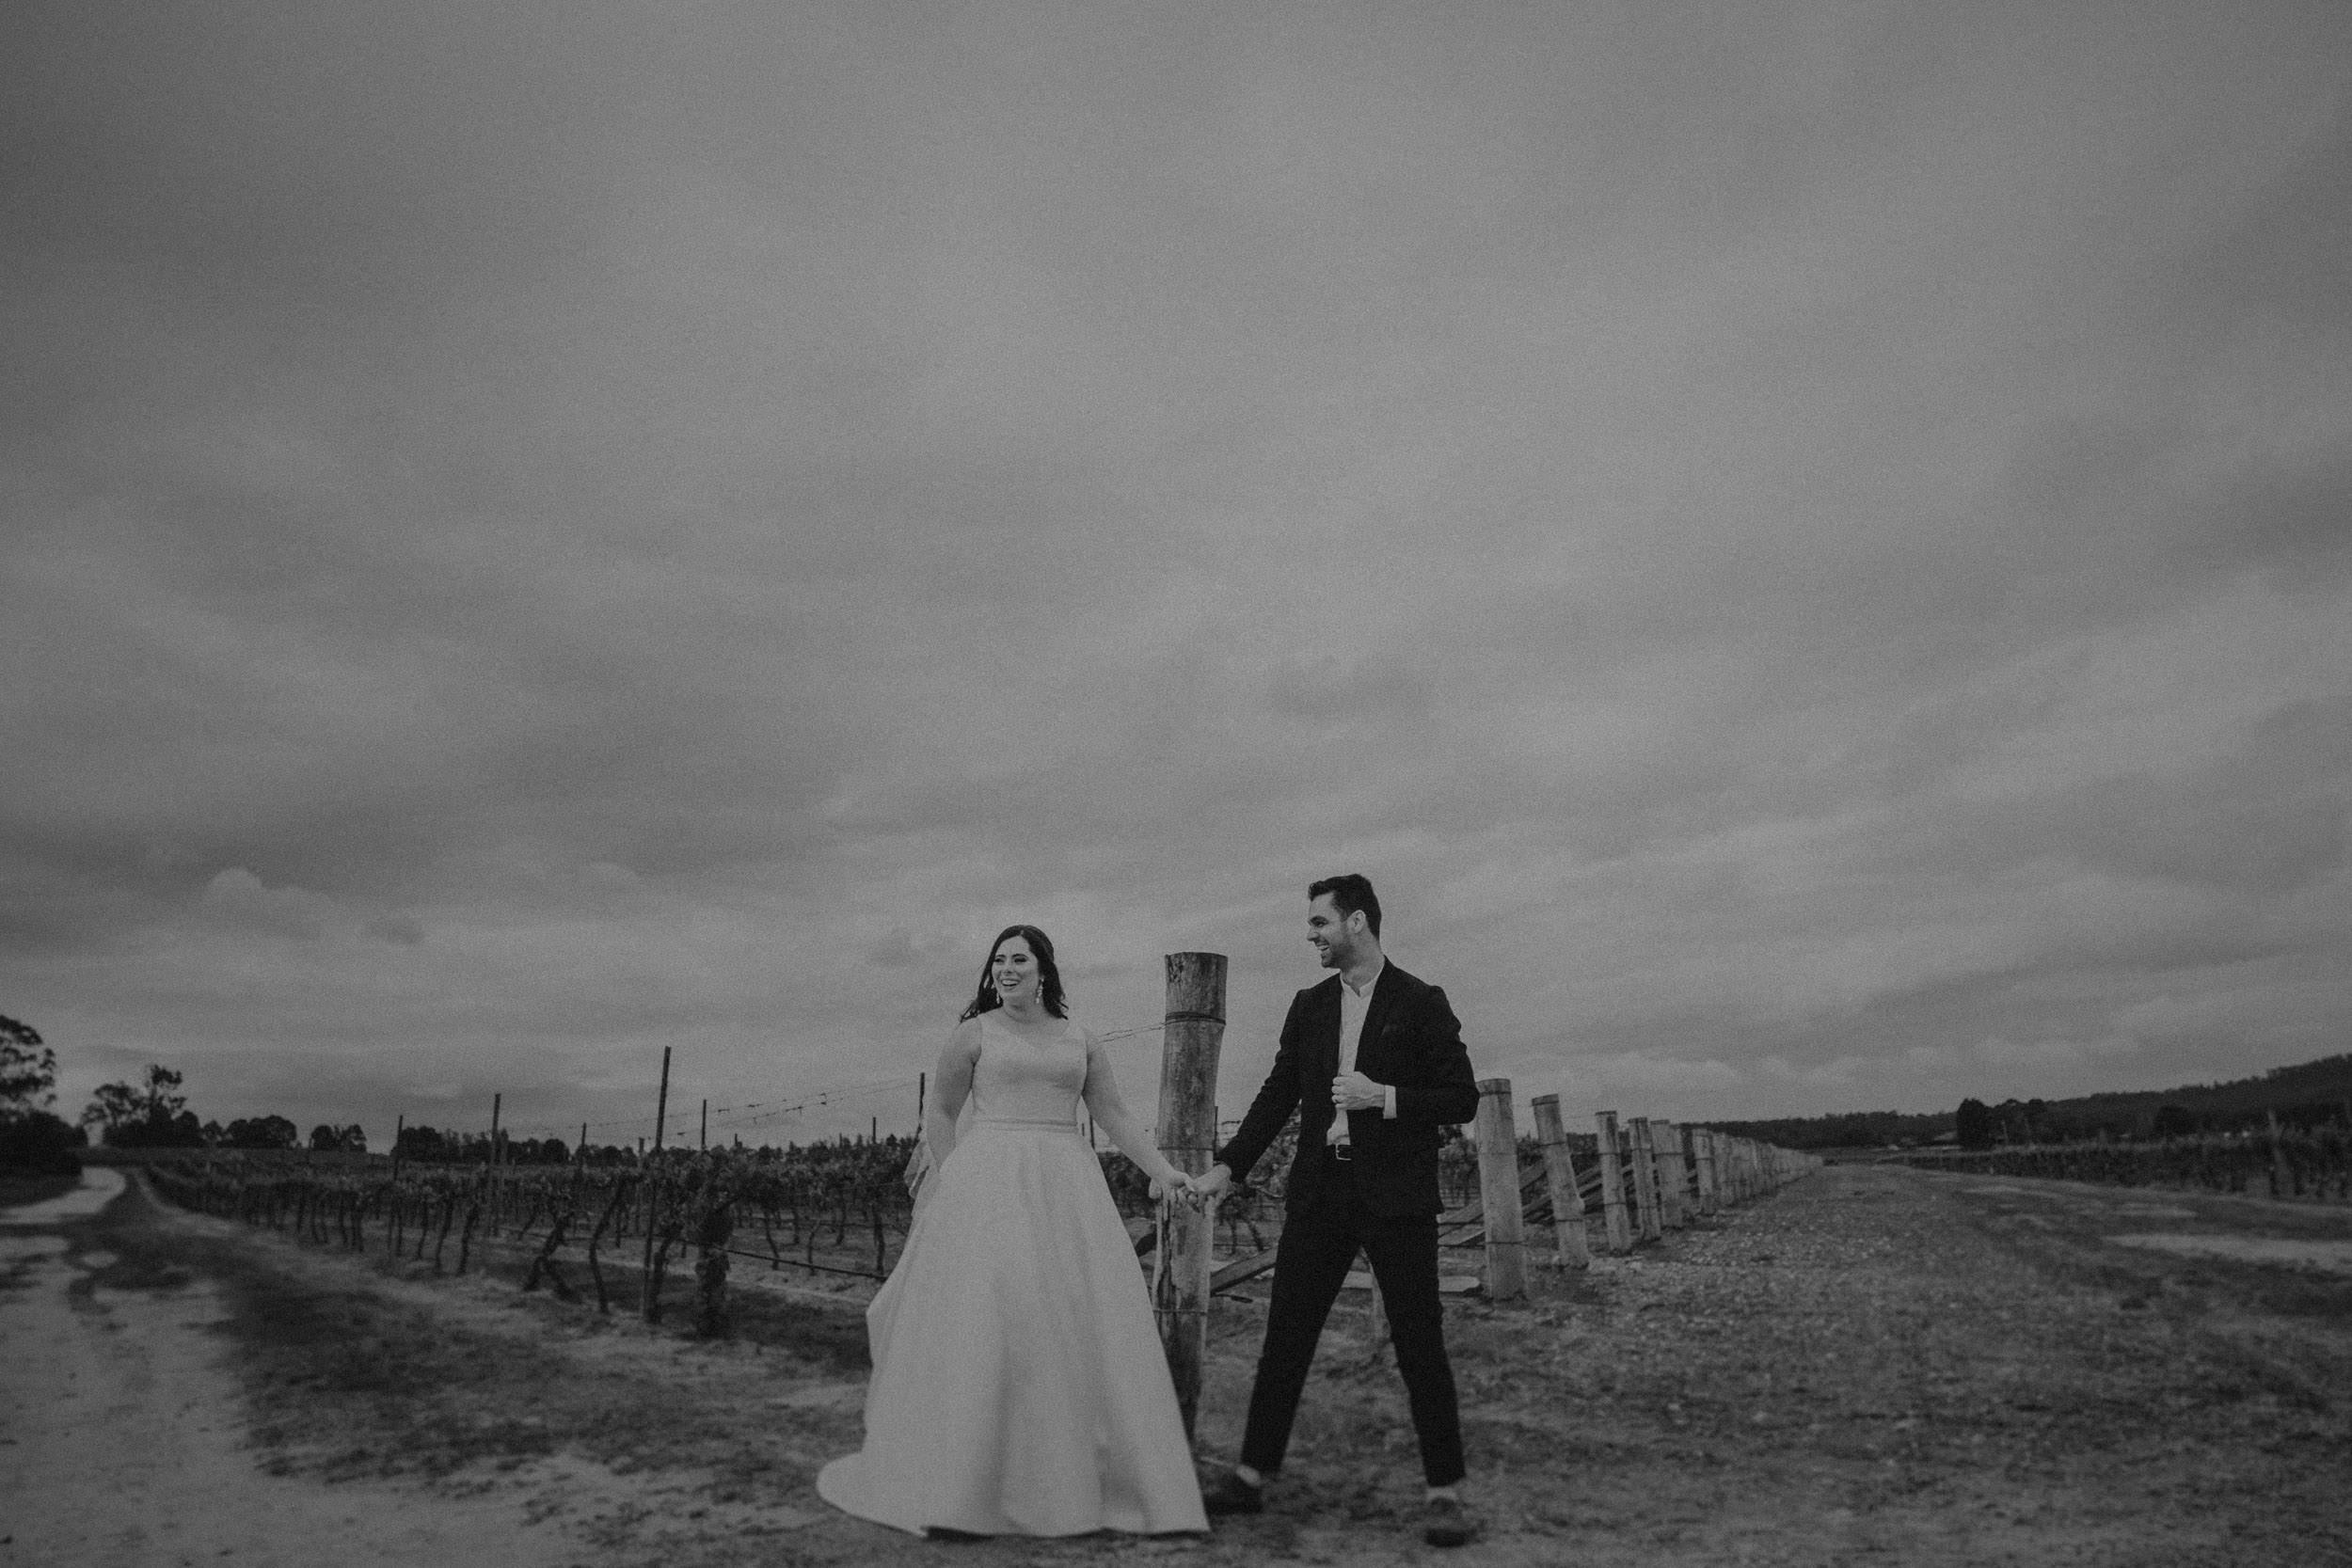 s+j_top_elopement wedding photography_kings & thieves_blog - 380.jpg